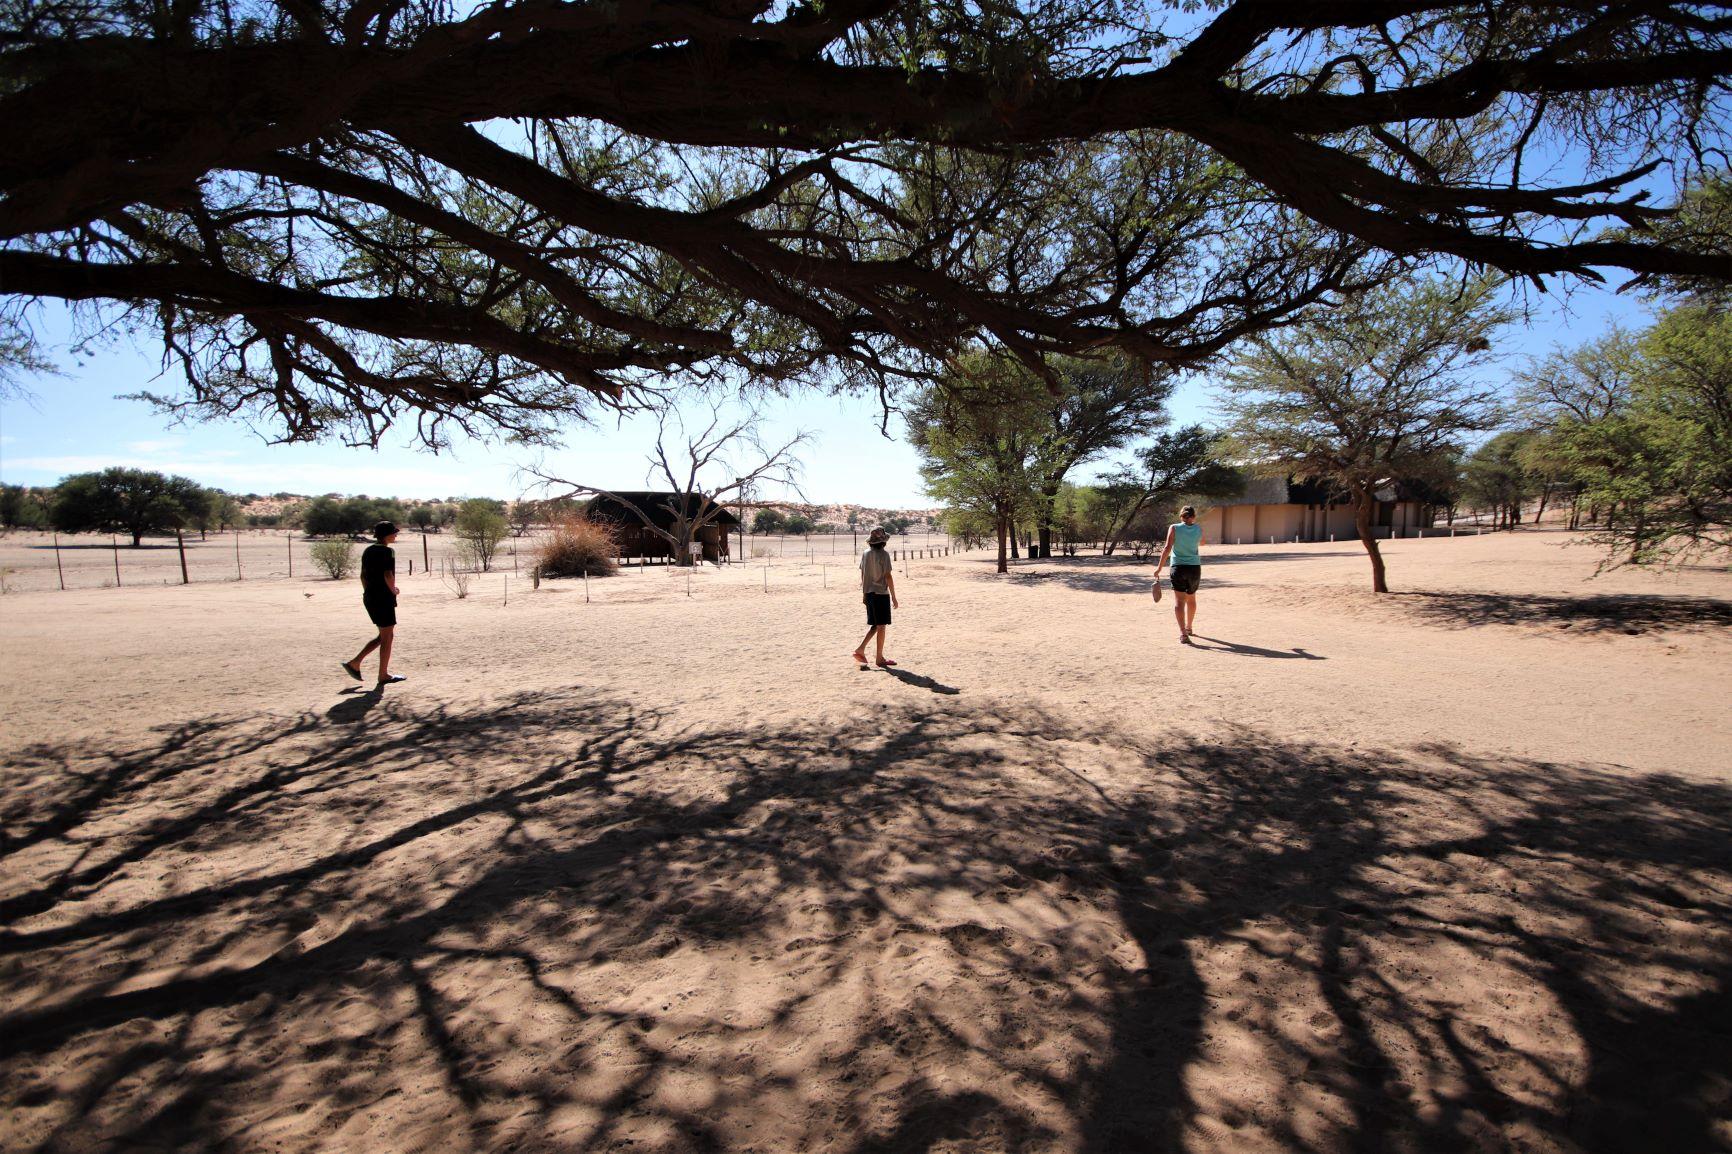 Camping in the Kgalagadi